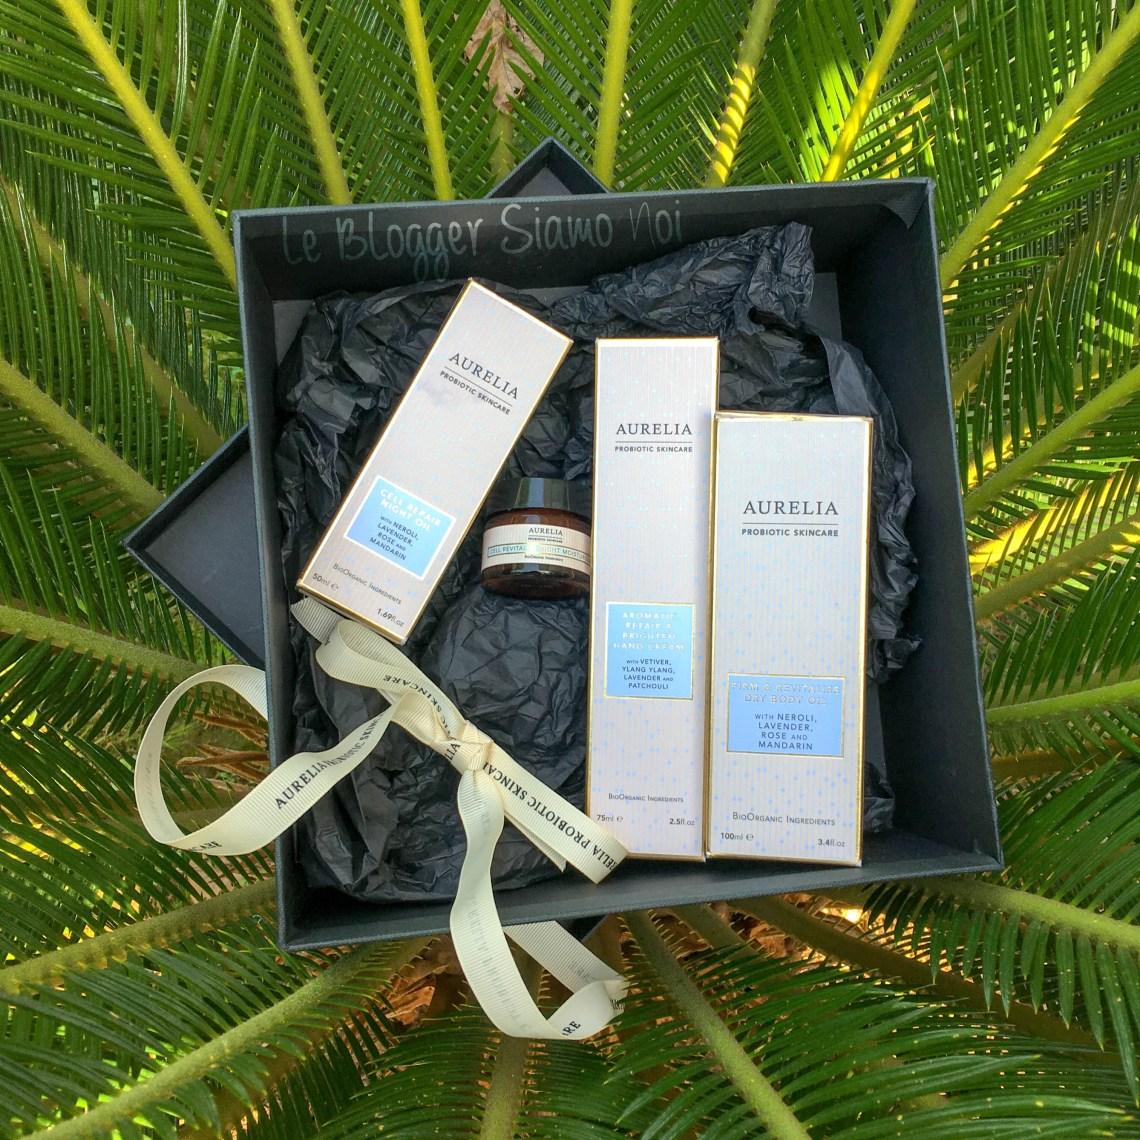 Nourish e Glow Collection - Aurelia Probiotic Skincare